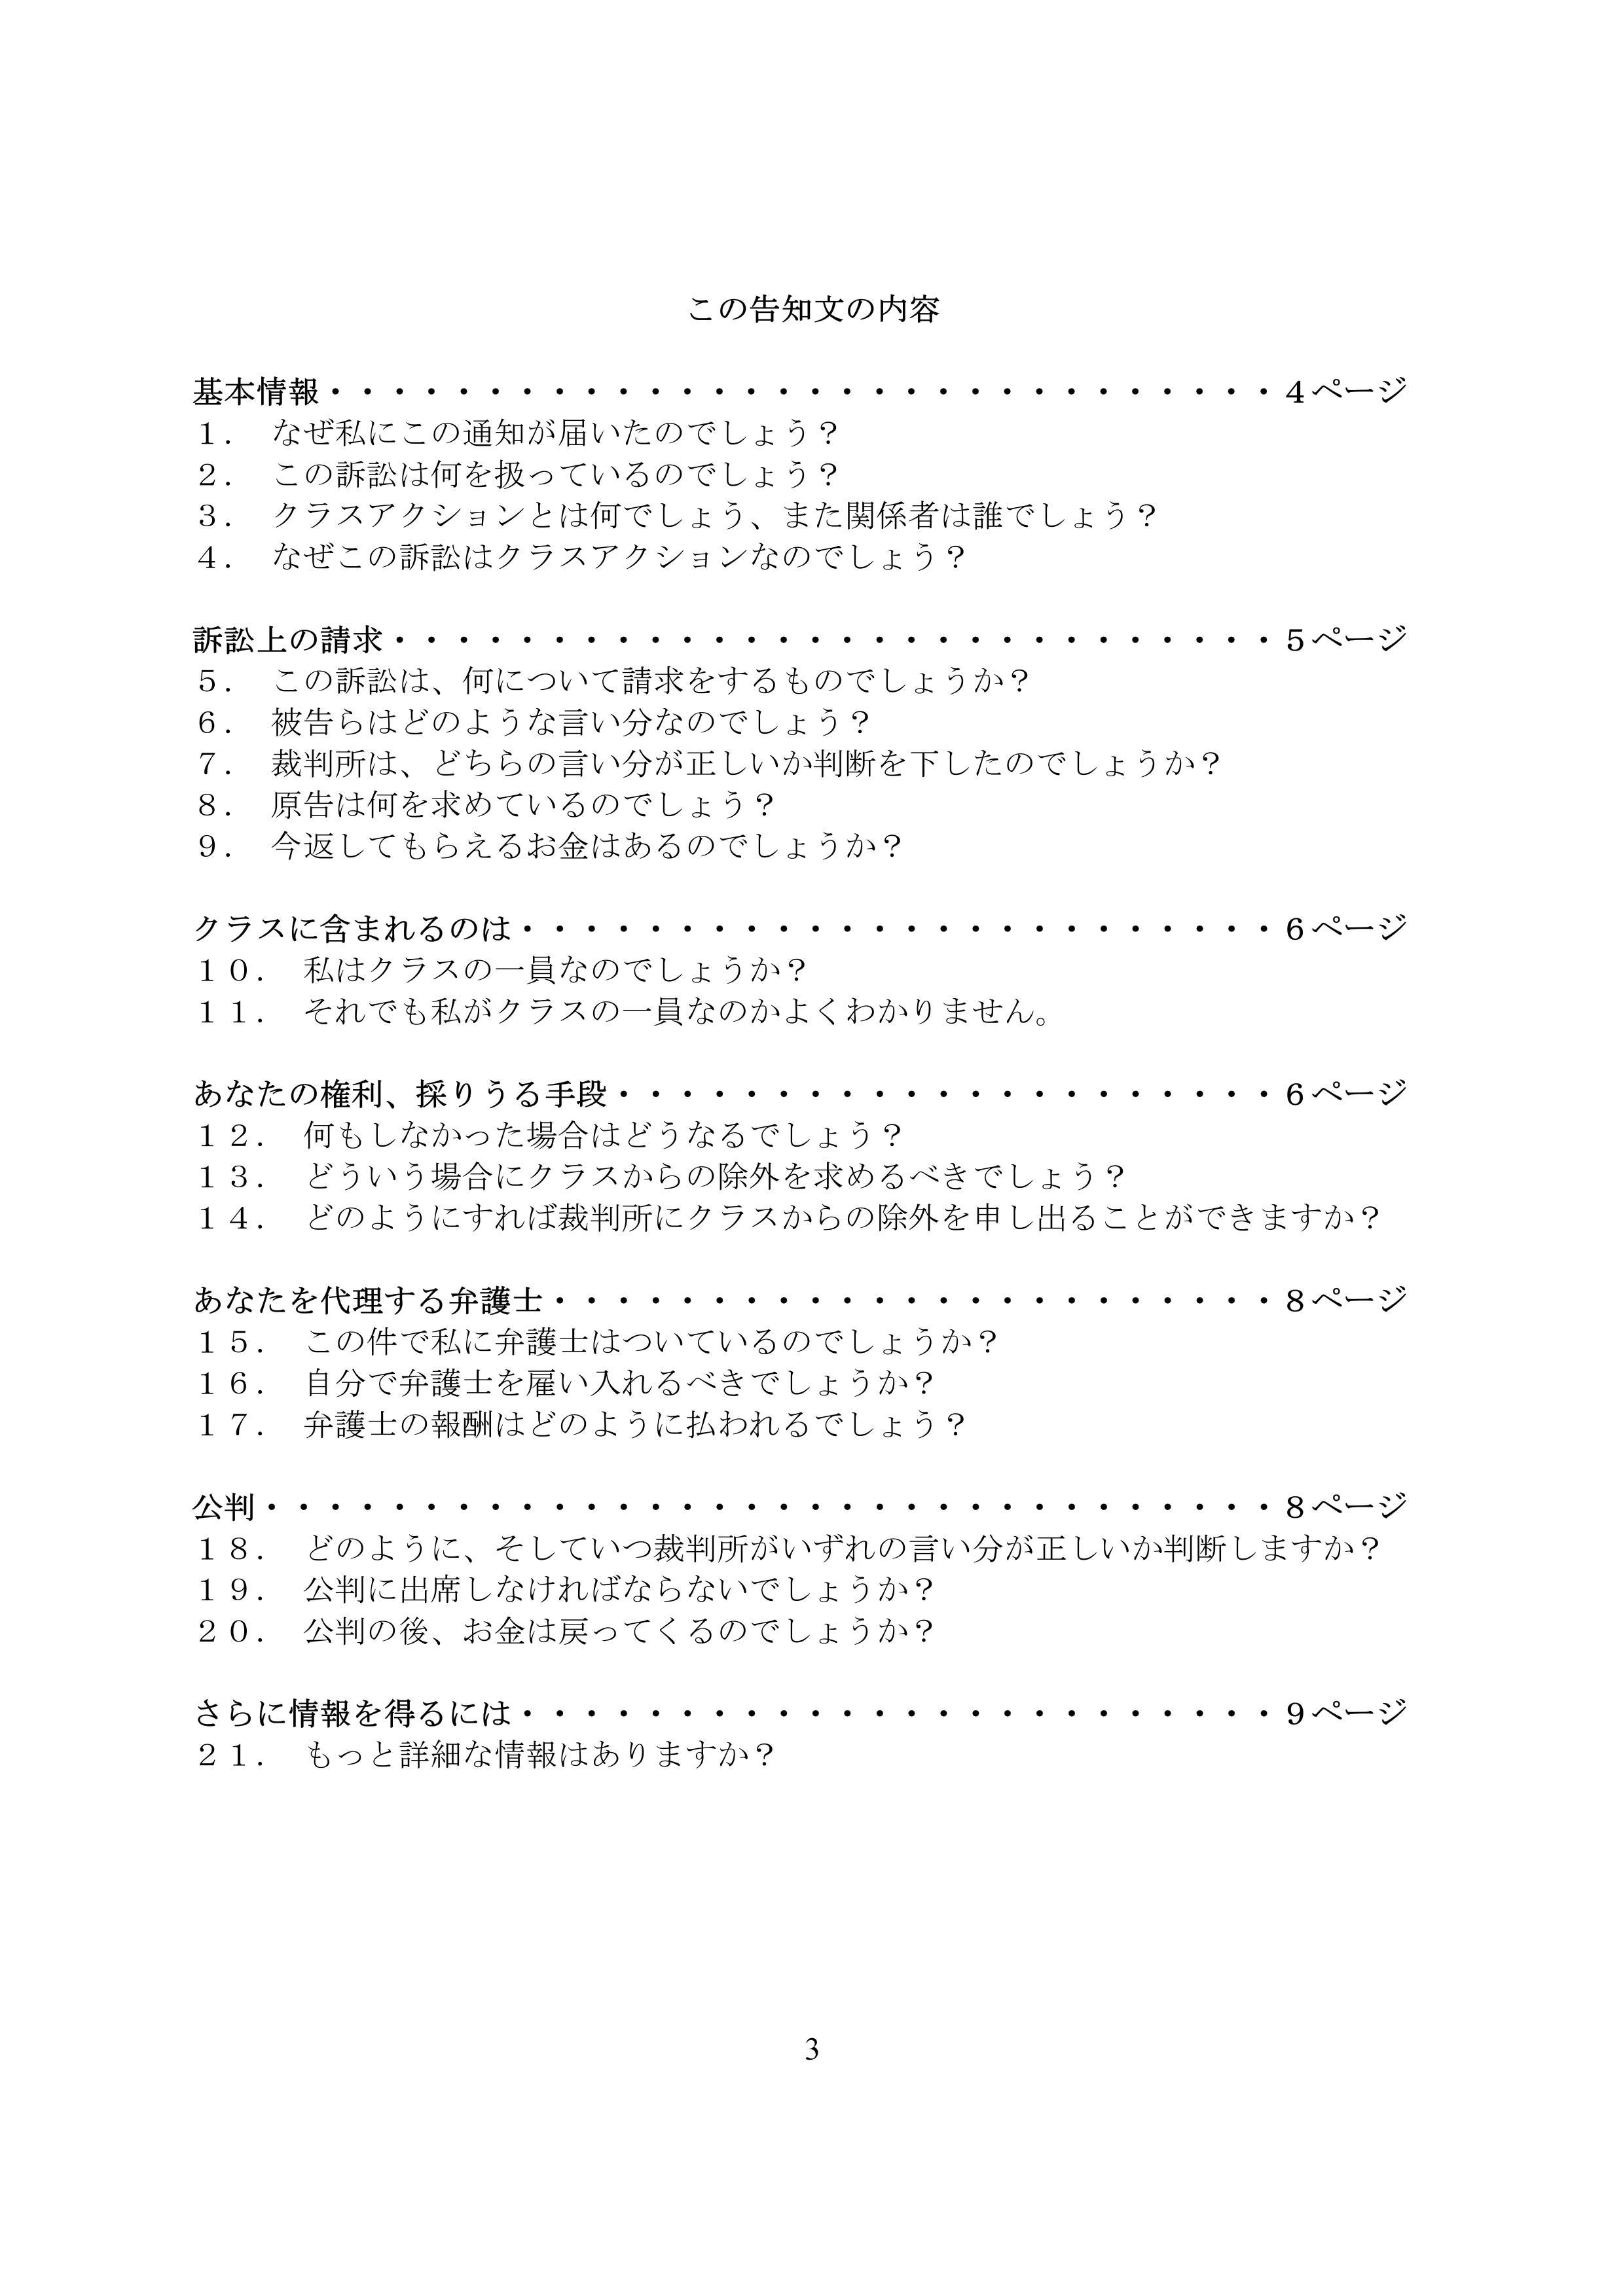 MRI Class Cert Notice_Japanese translation_03